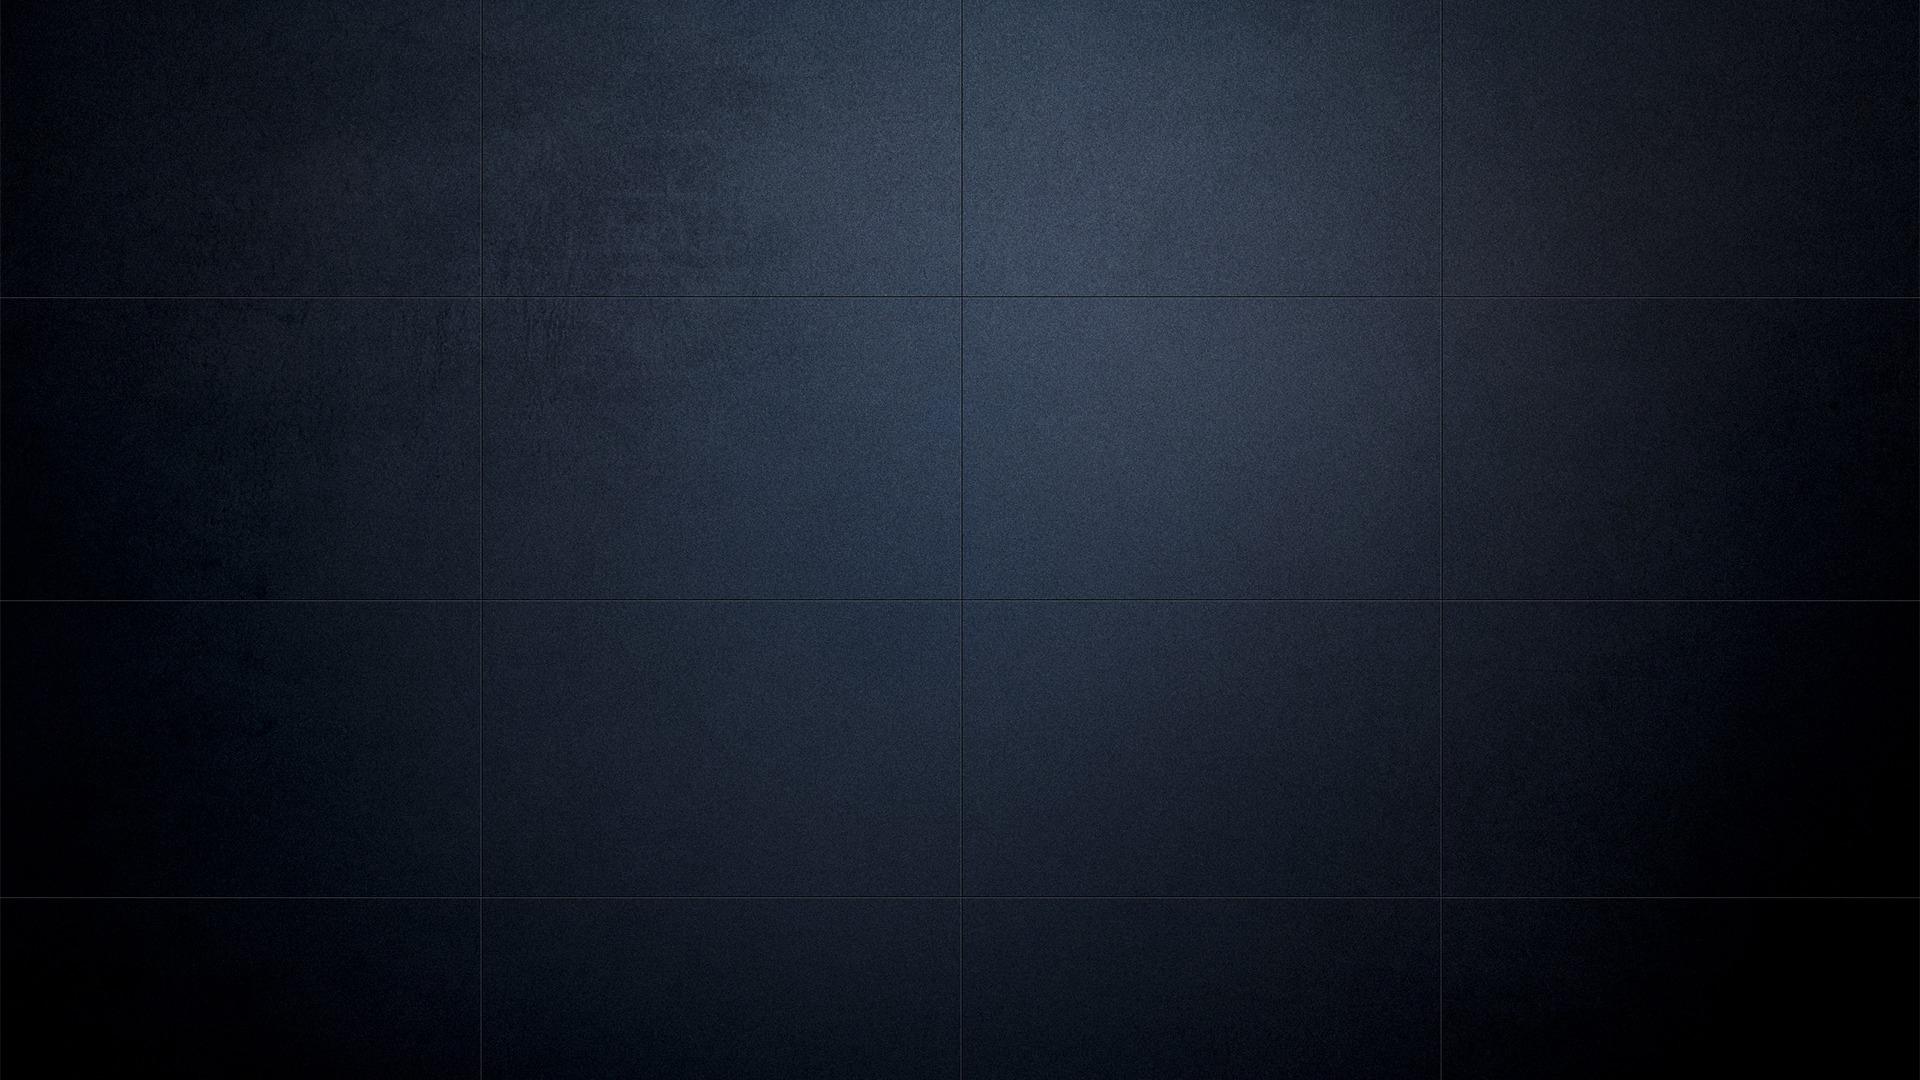 Download Wallpaper 1920x1080 Walls Background Black Stripes